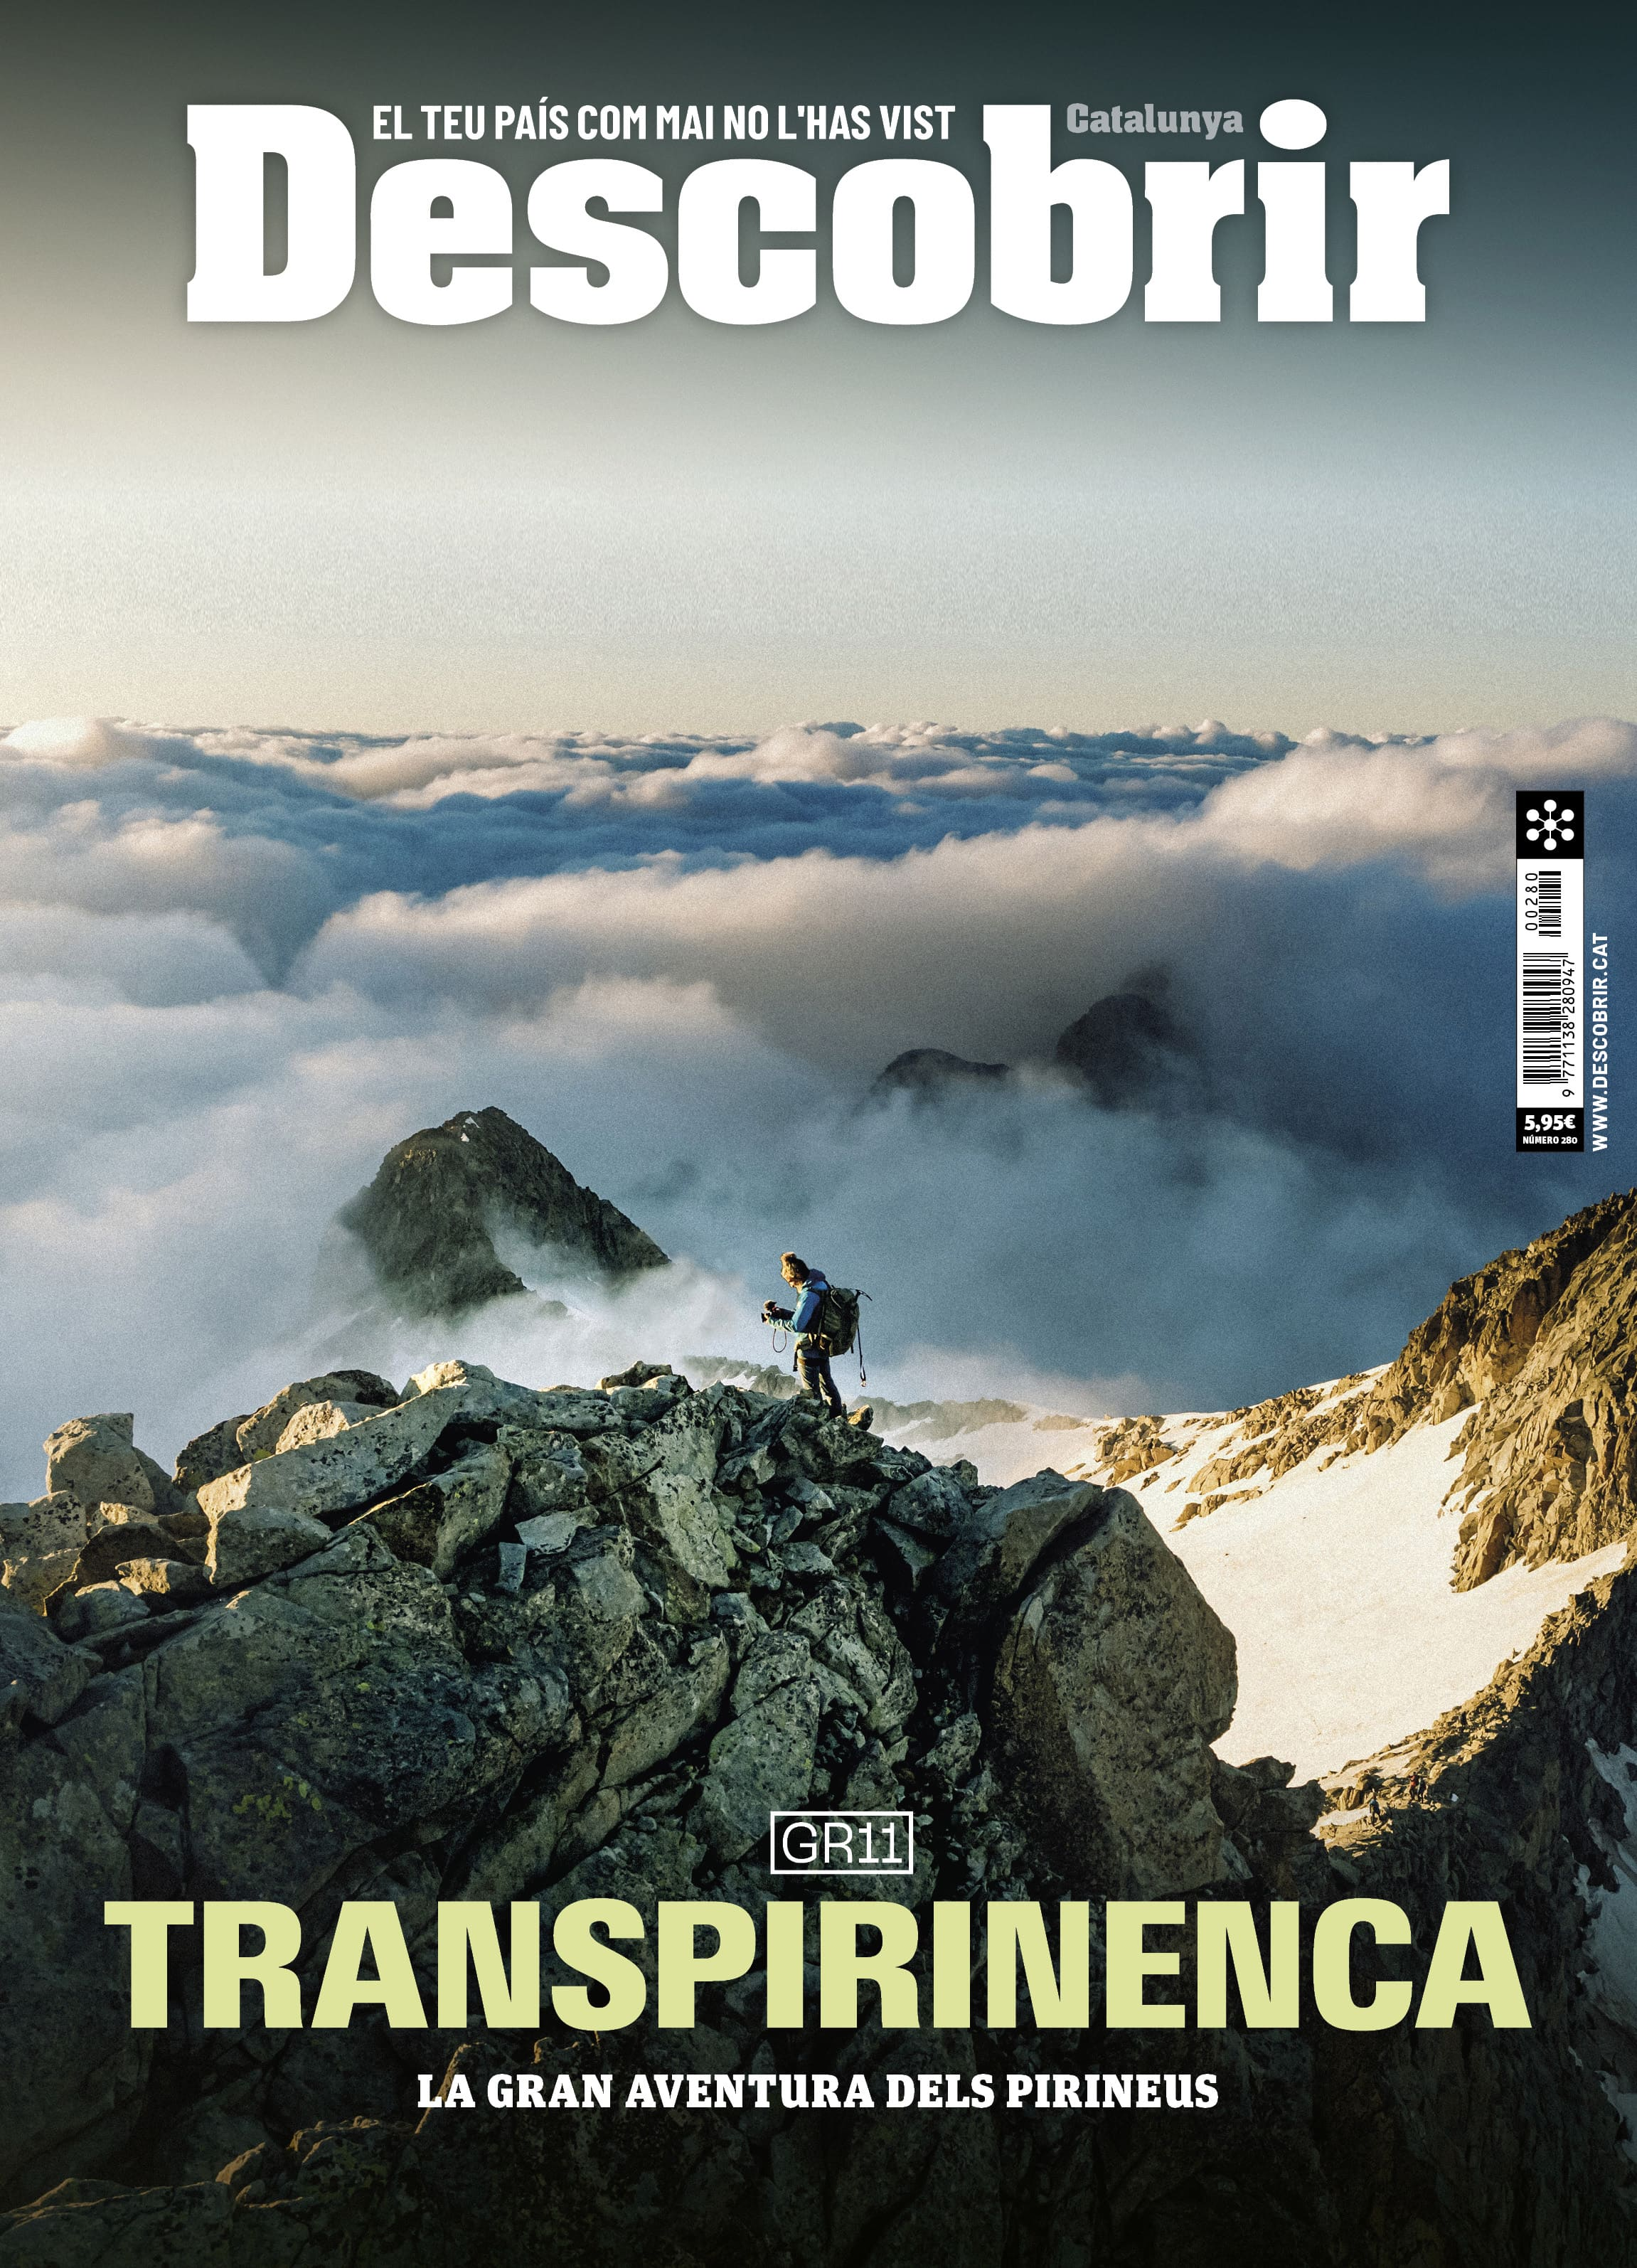 Transpirinenca, la gran aventura dels Pirineus